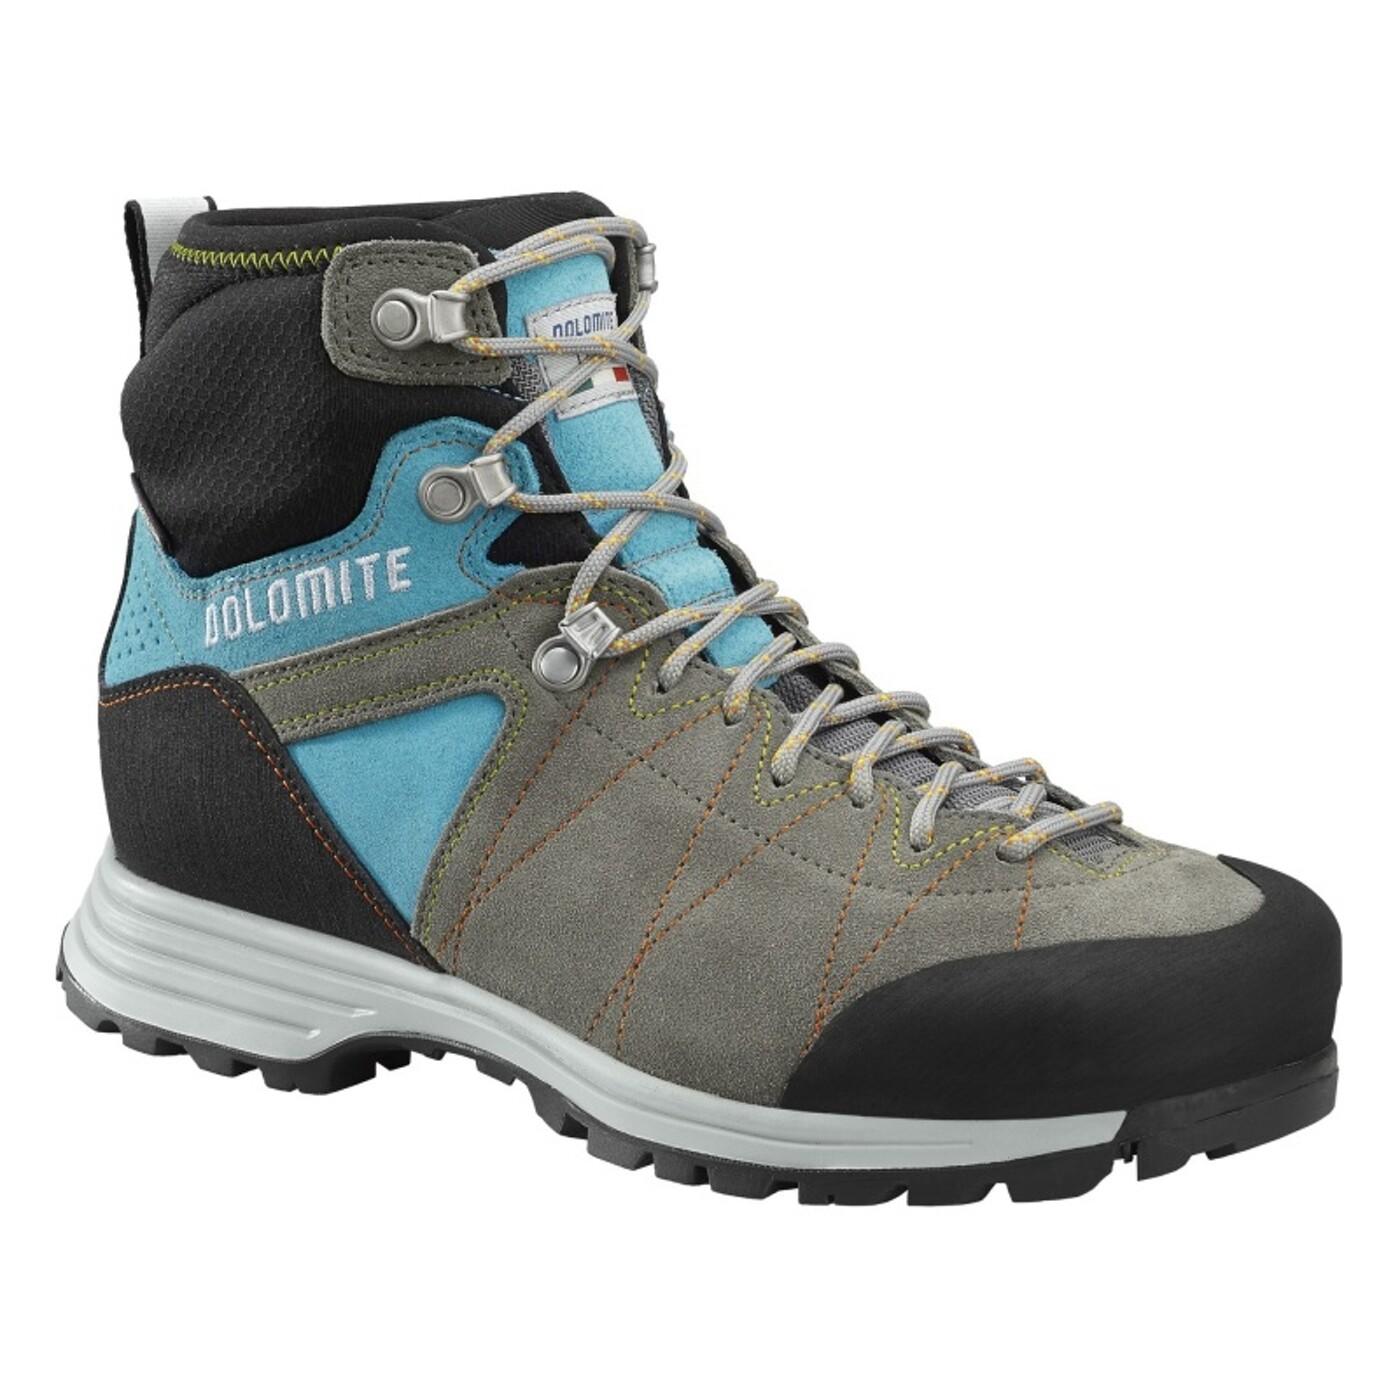 SCOTT Wanderschuh DOL Shoe Steinbock Hike Gtx Wmn 1.5 Dolomite - Damen